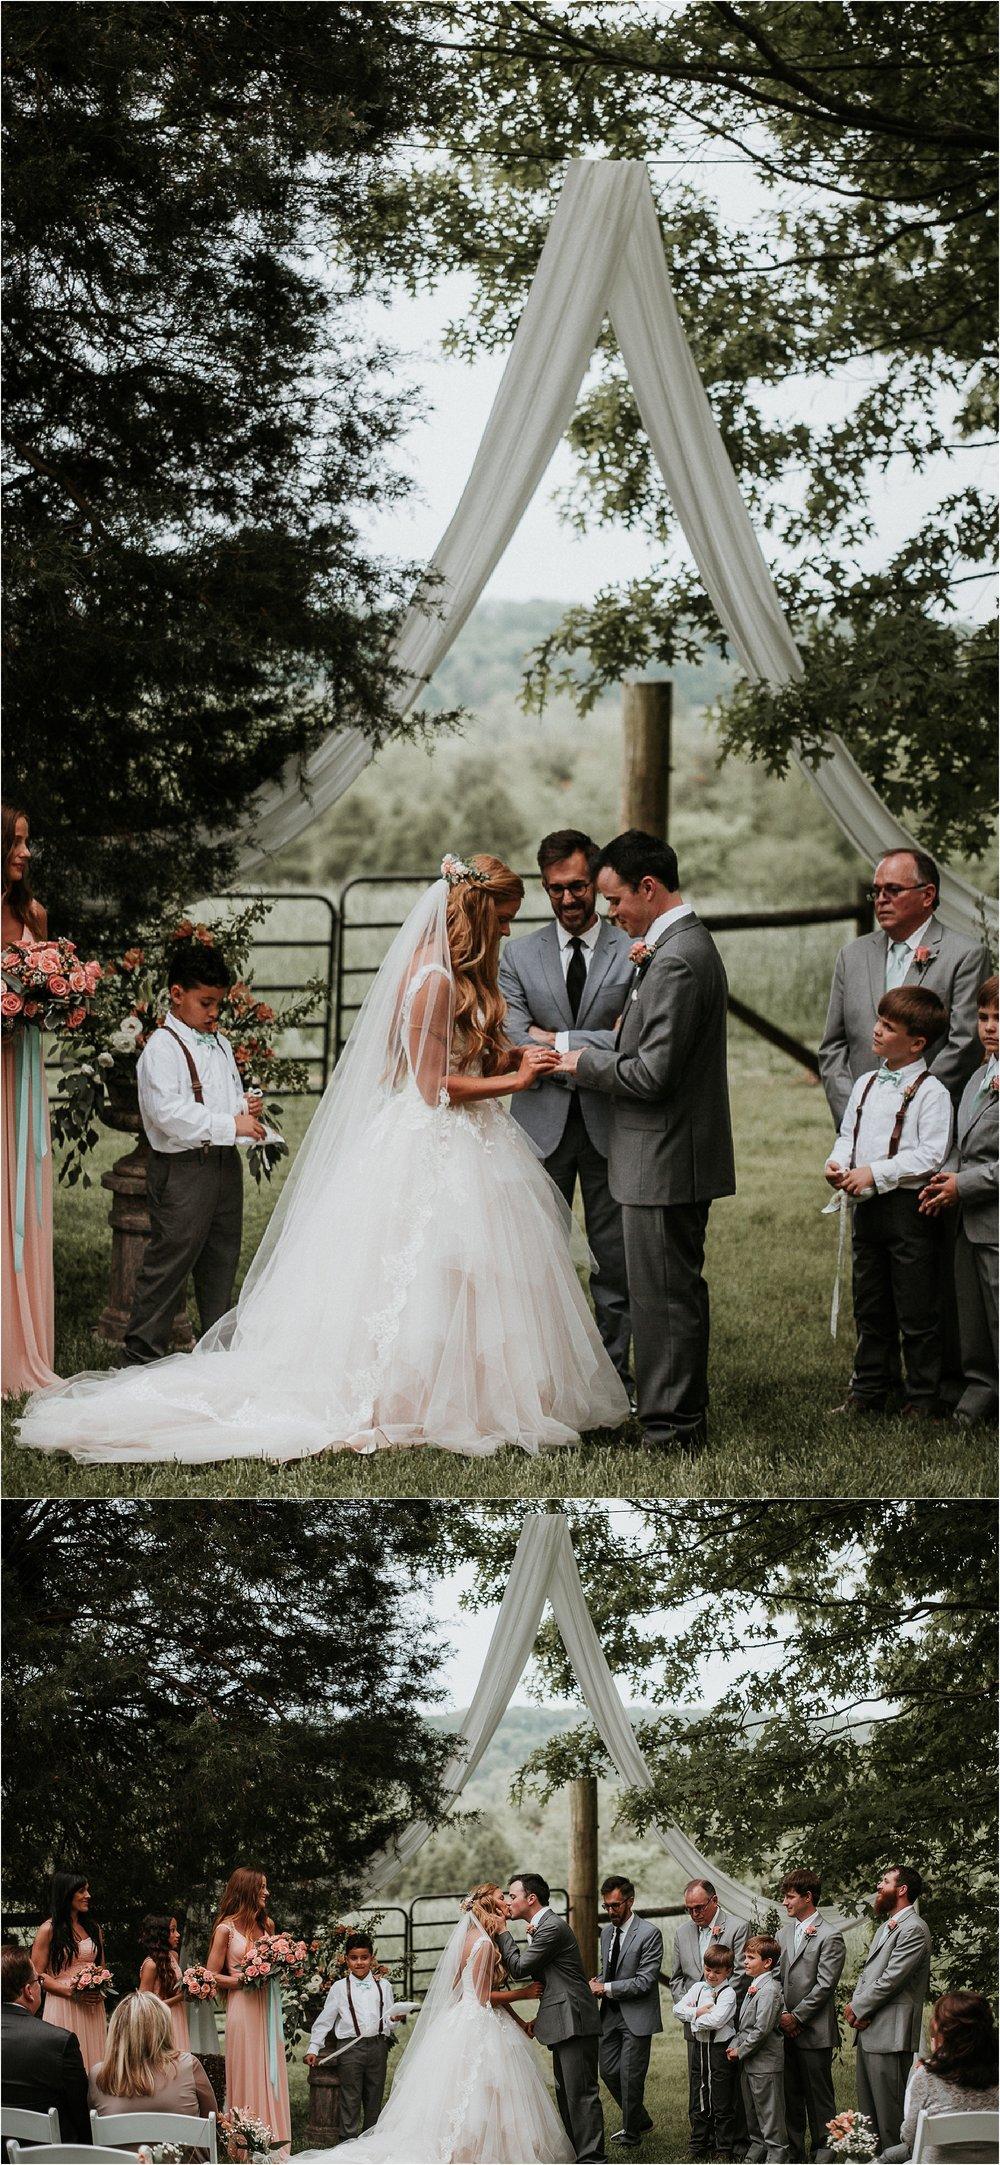 Carolina-Country-Weddings-Mount-Pleasant-nc-105.jpg